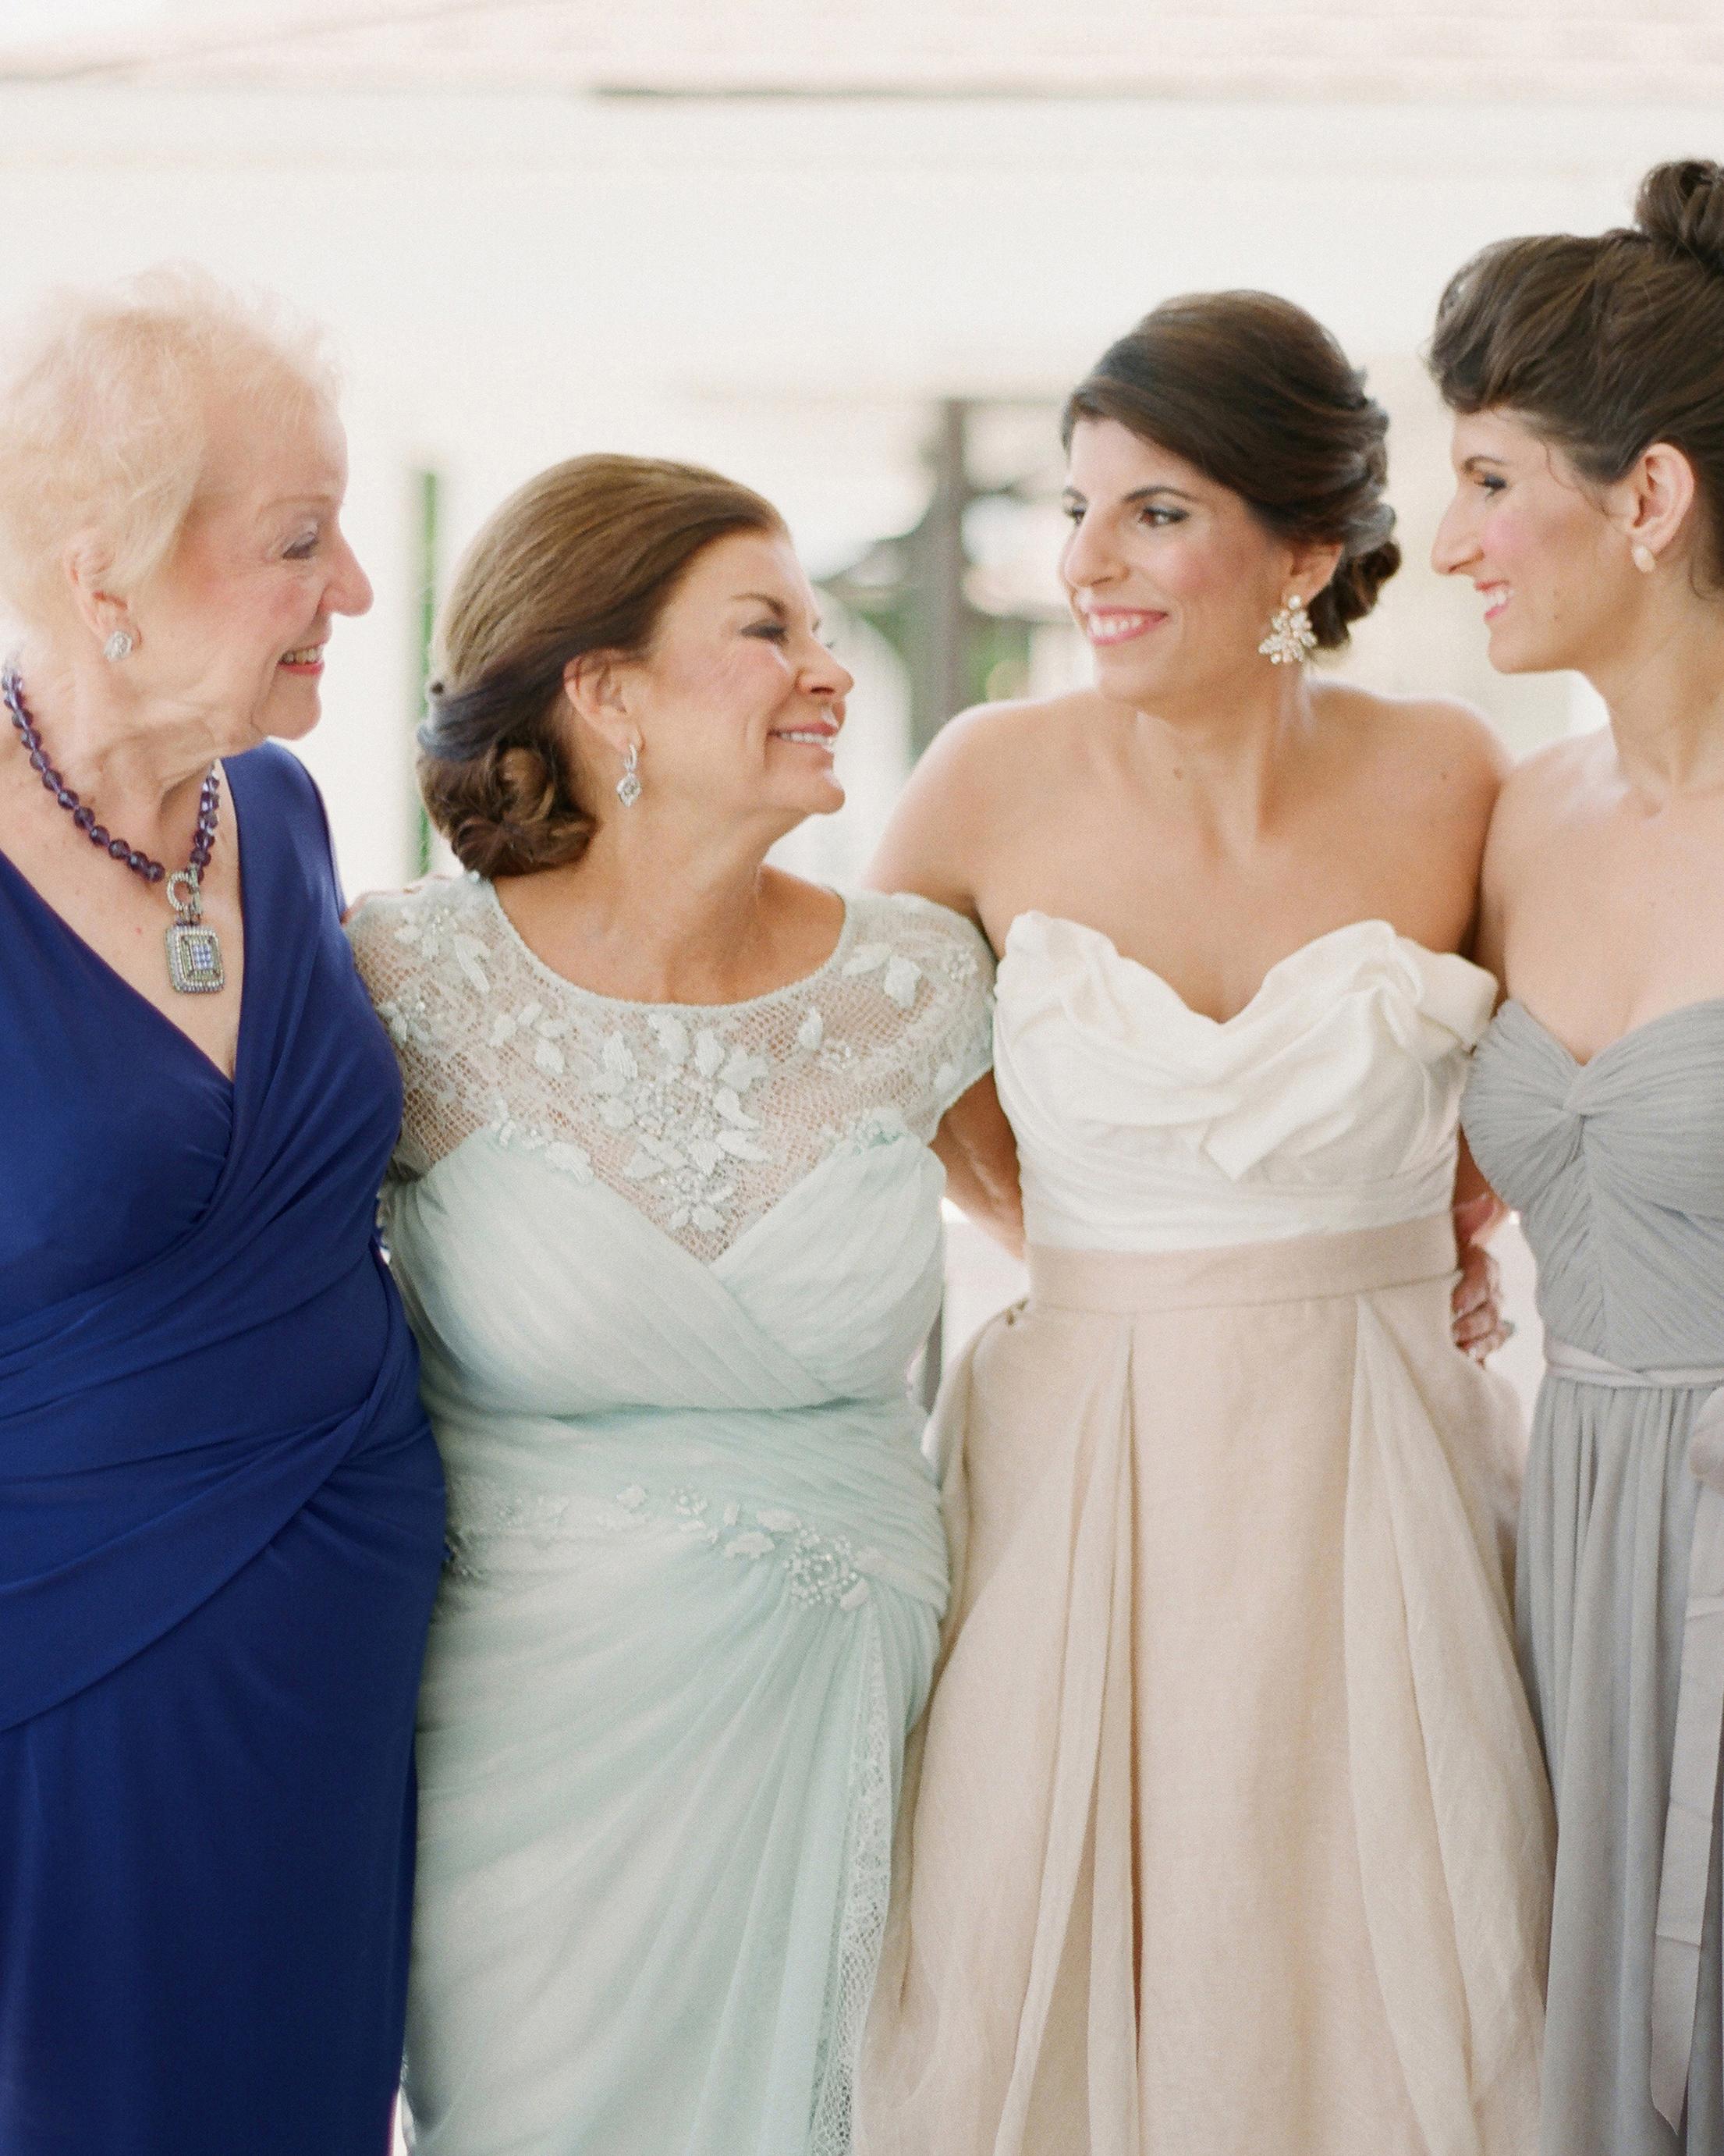 catherine-adrien-wedding-family-0256-s111414-0814.jpg